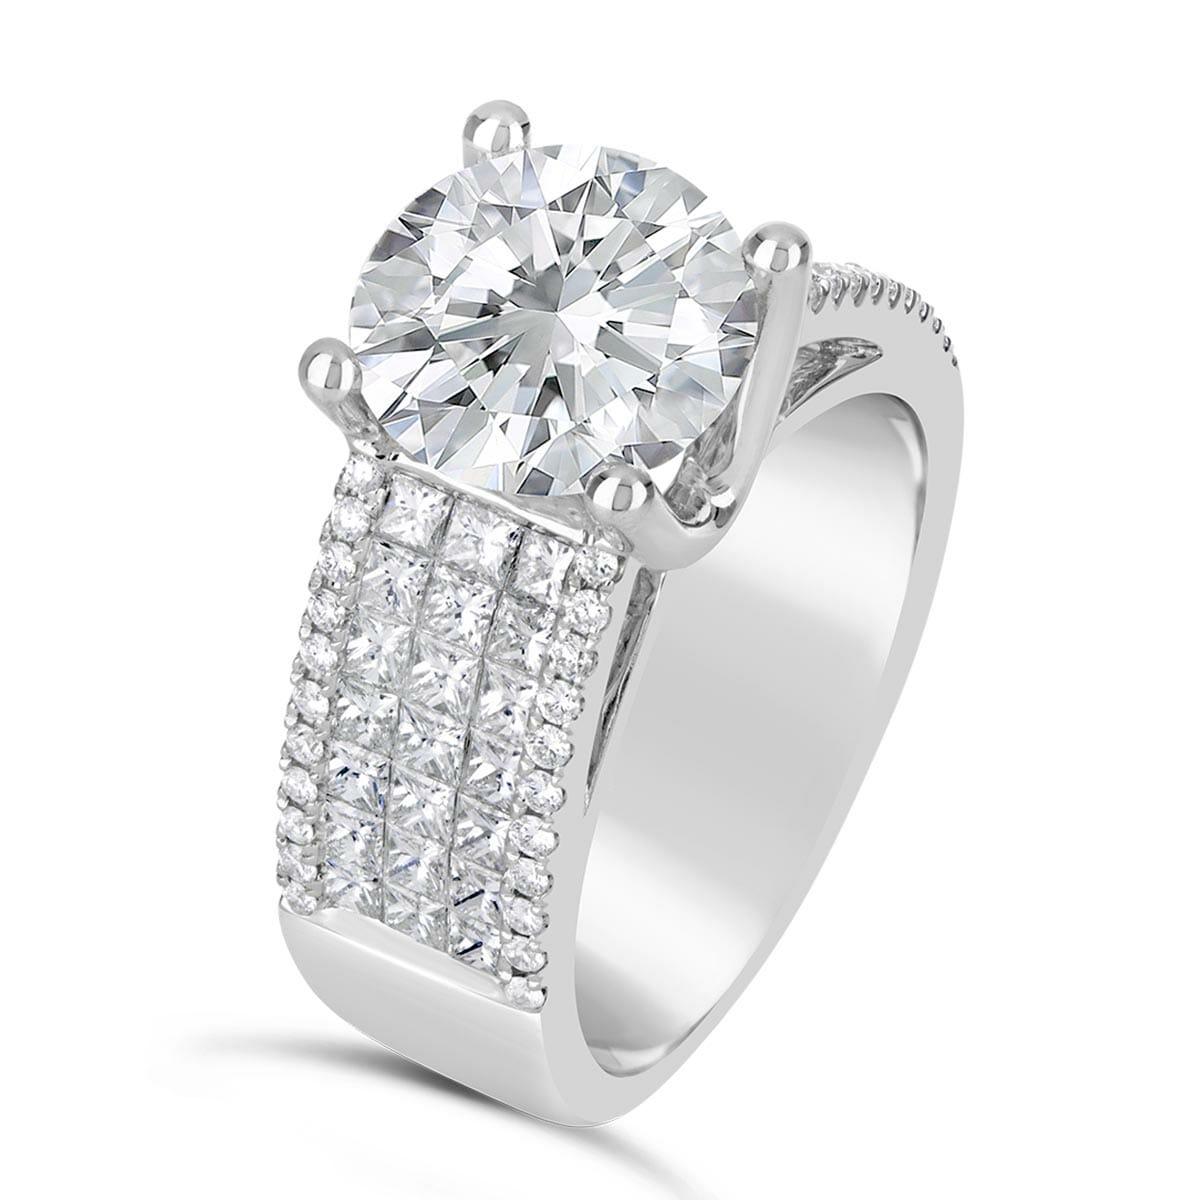 Wide Band Diamond Engagement Ring The Diamond Guys Collection The Diamond Guys